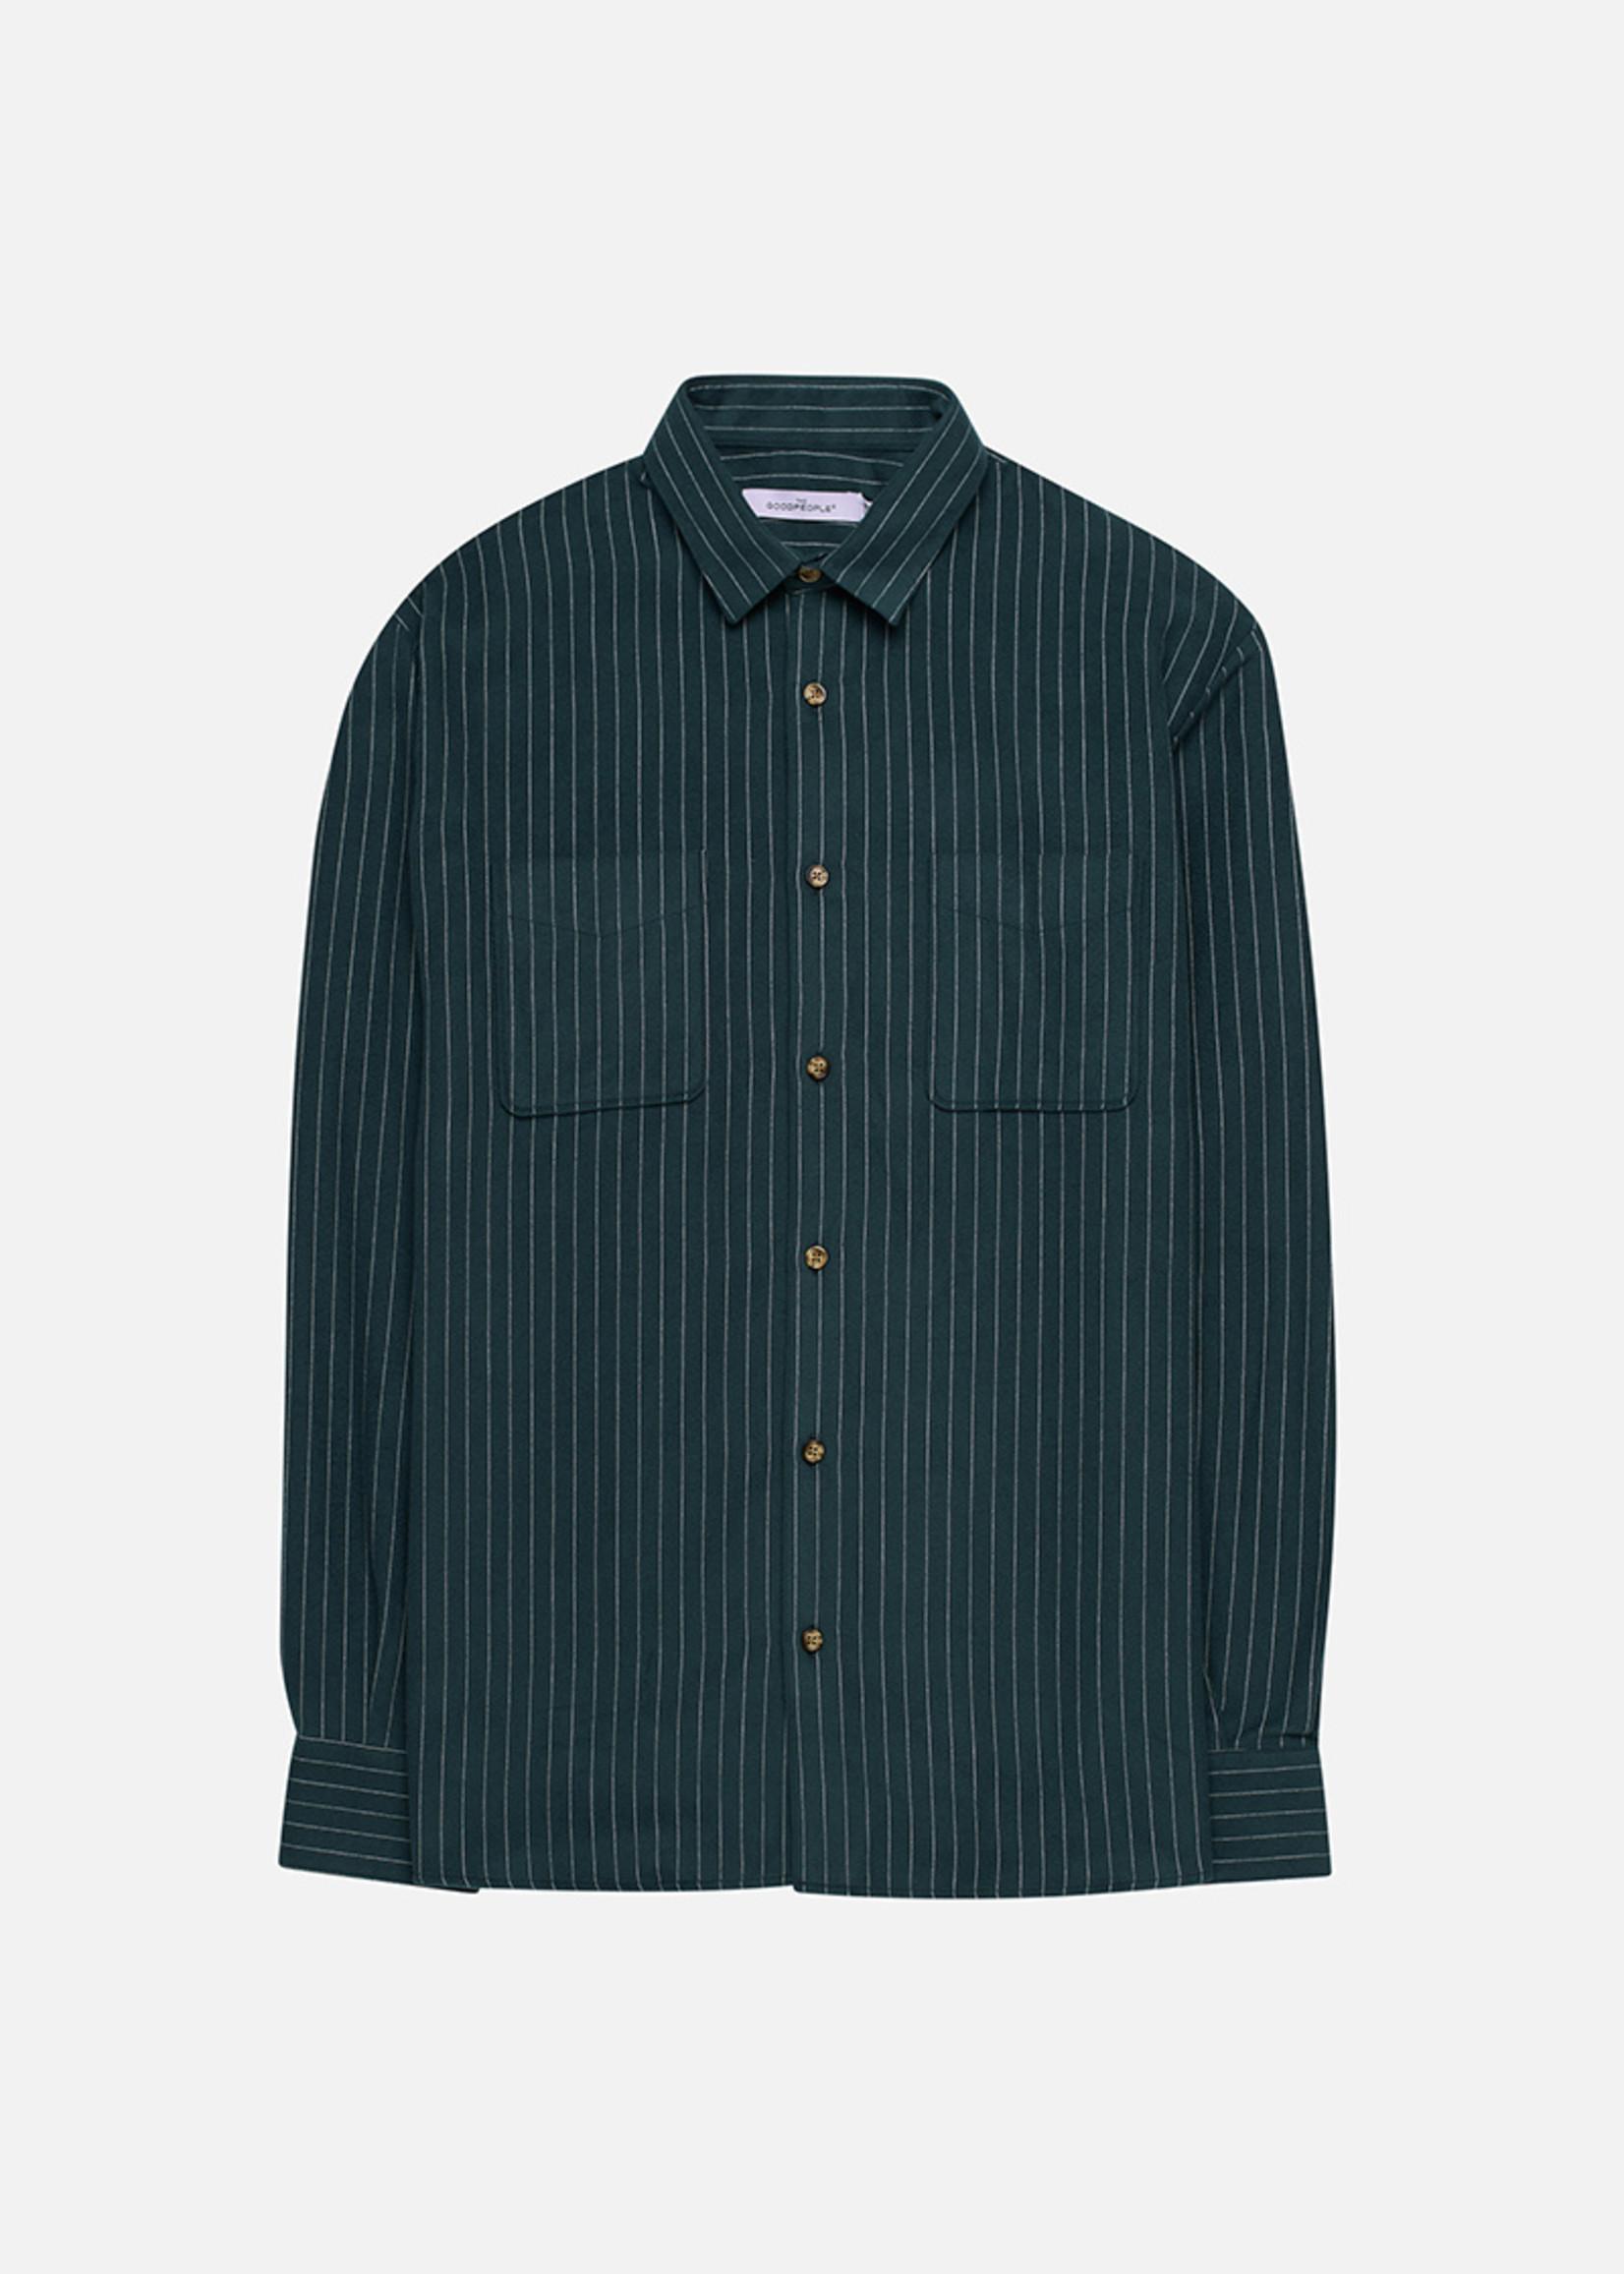 The GoodPeople Samson Shirt